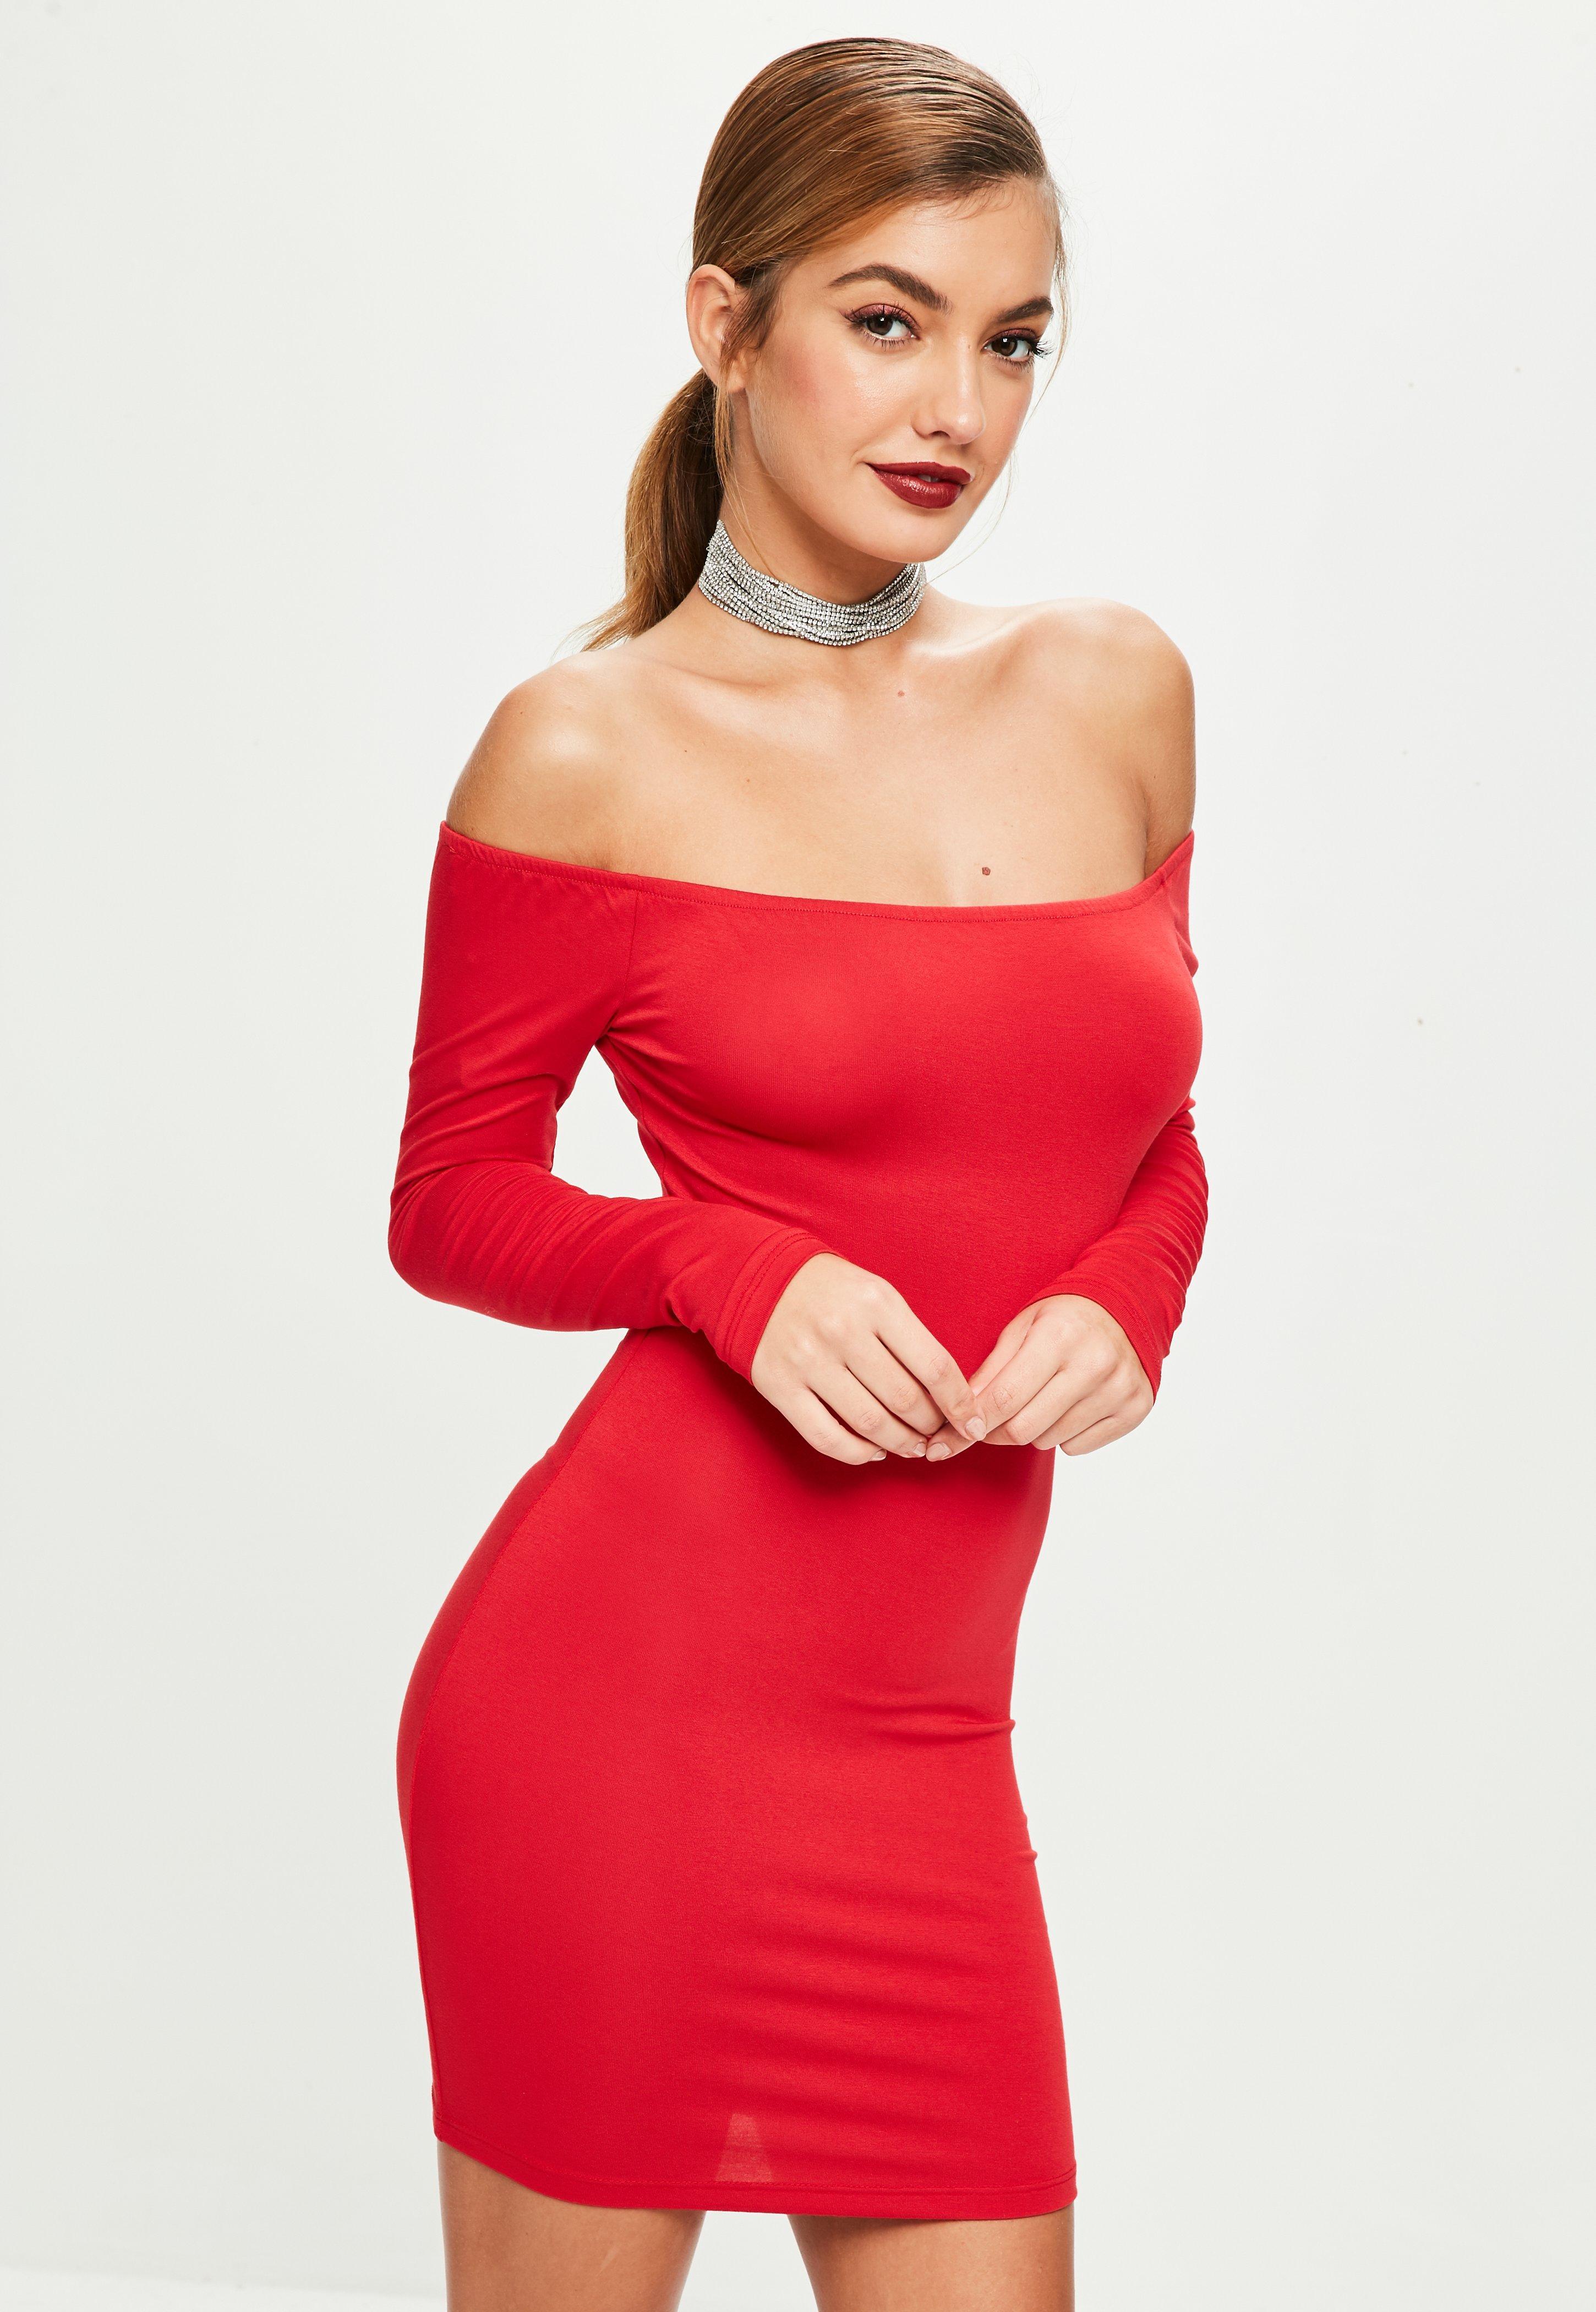 Rotes tragerloses kleid